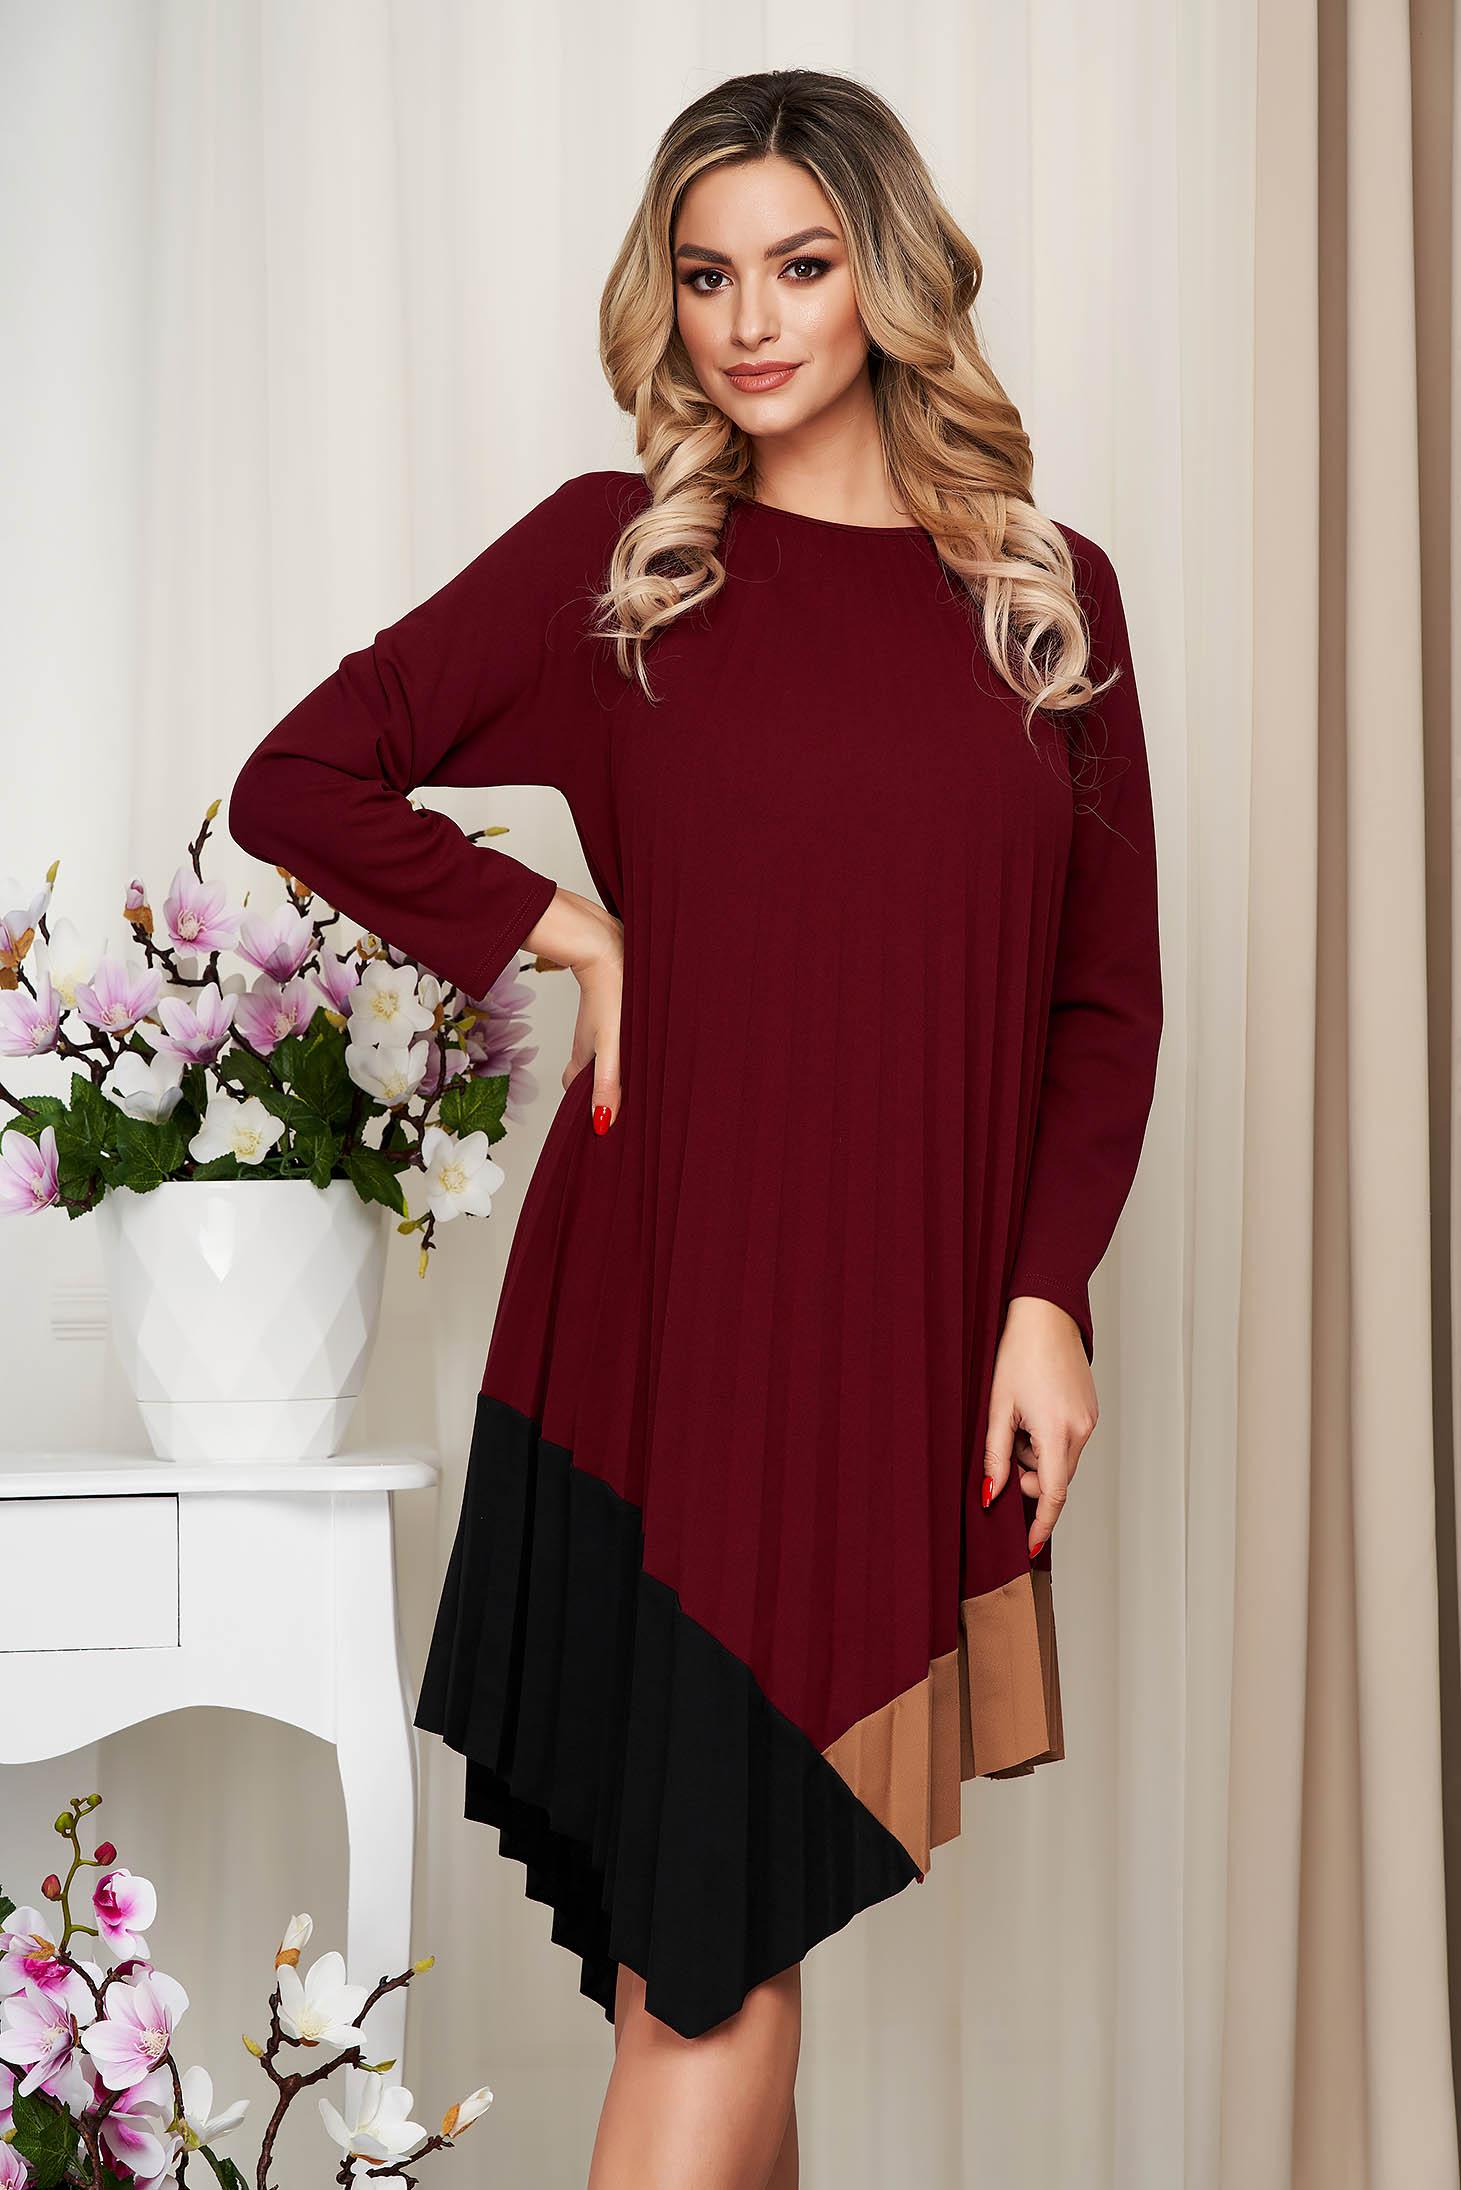 Burgundy dress loose fit asymmetrical folded up